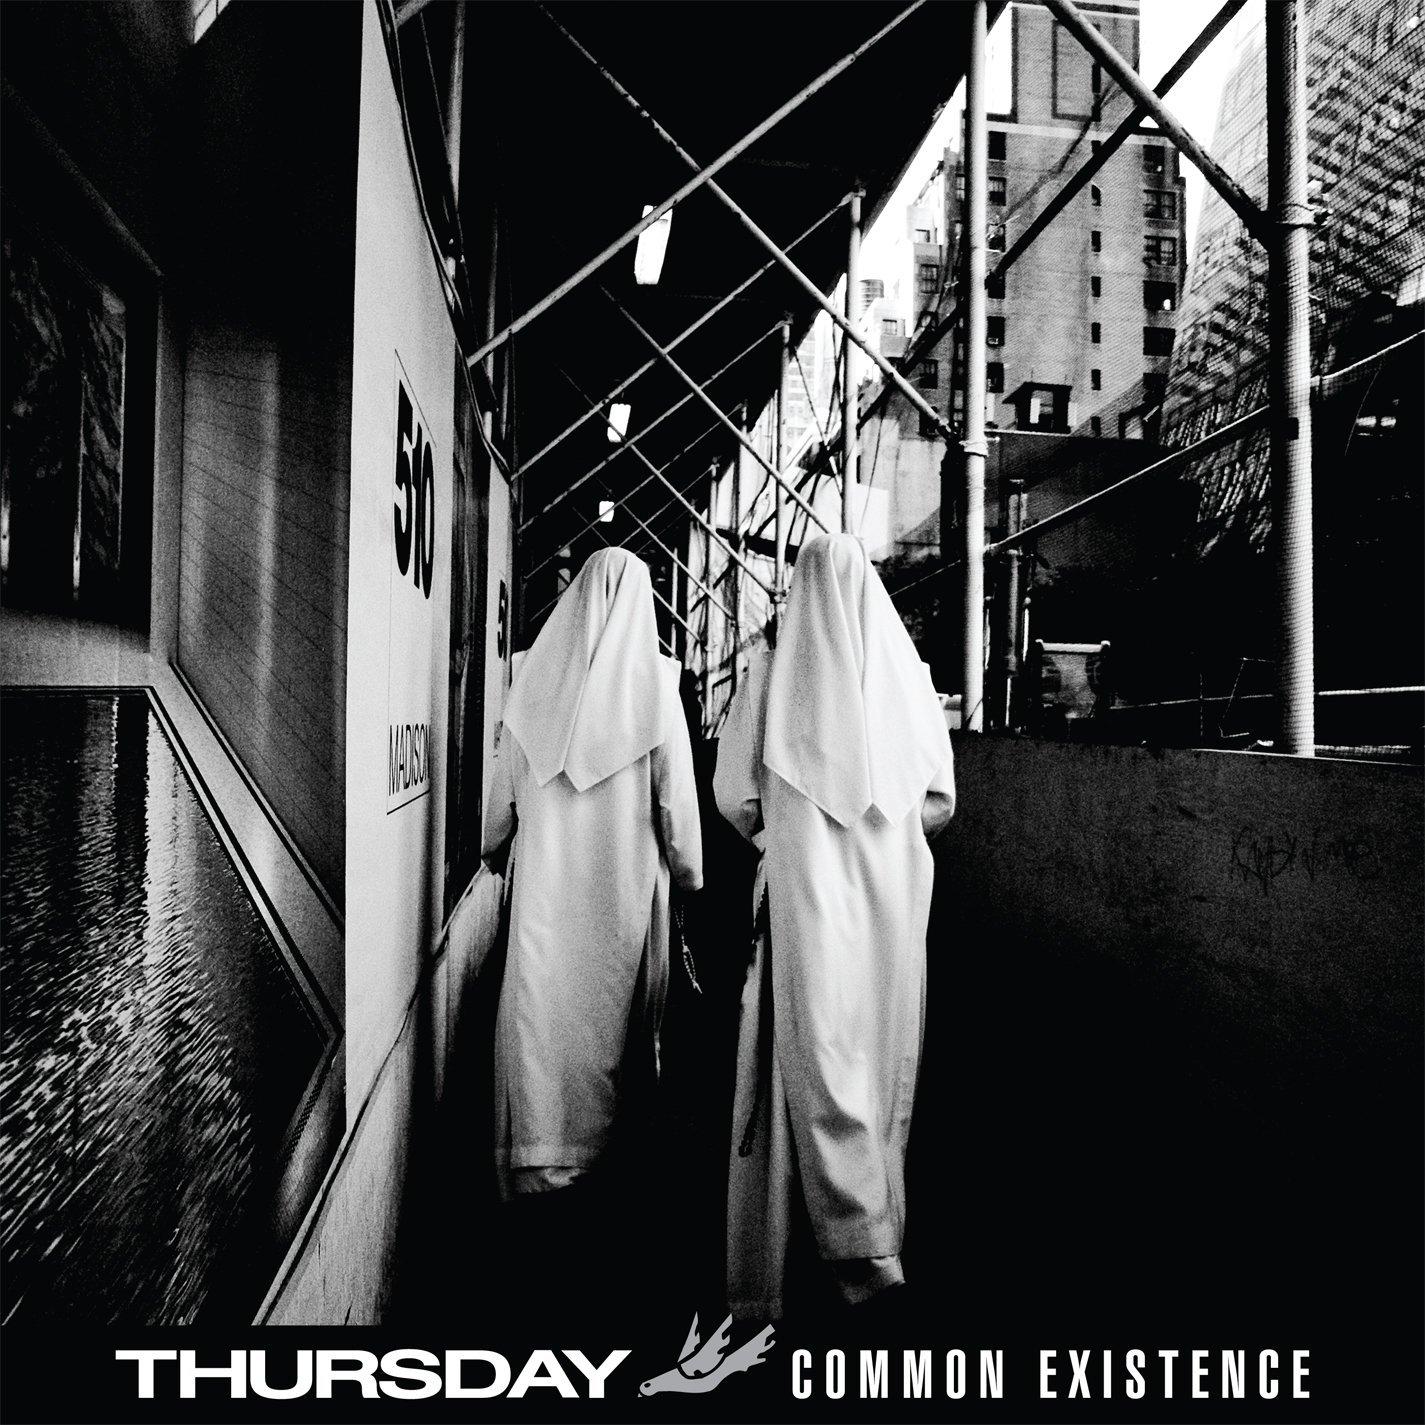 Thursday, Common Existence